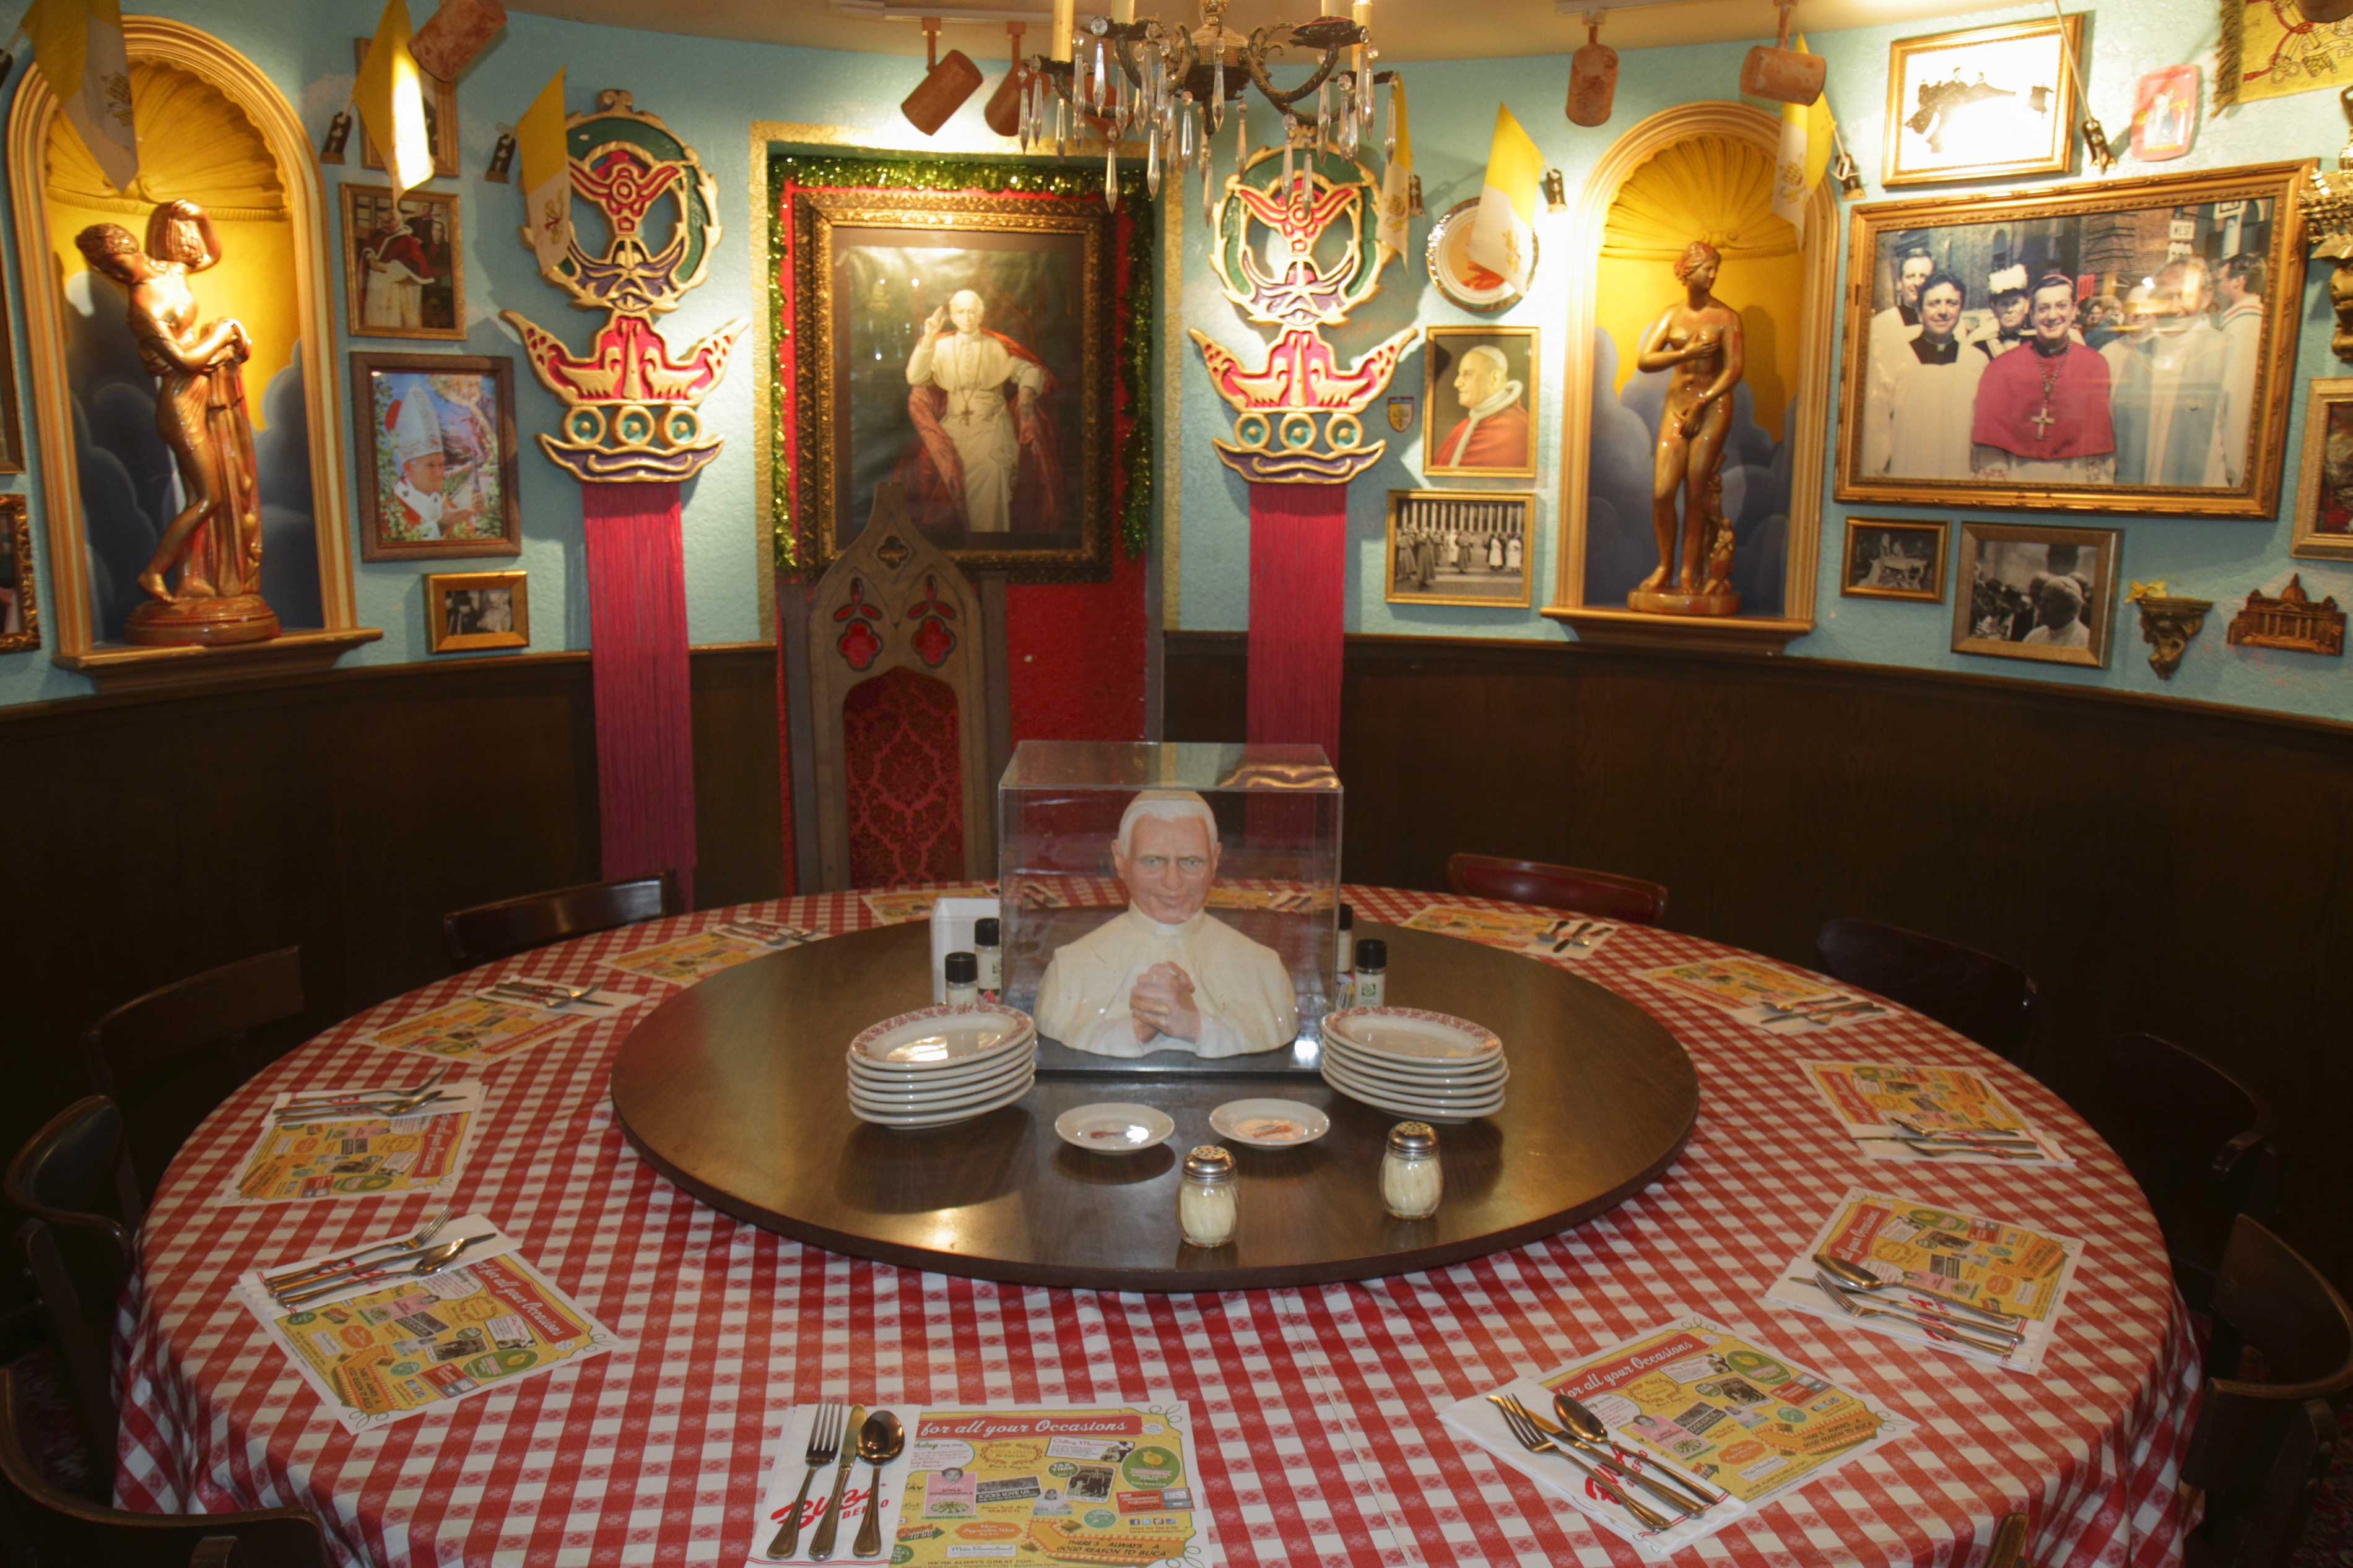 The interior of Buca di Beppo Italian Restaurant.